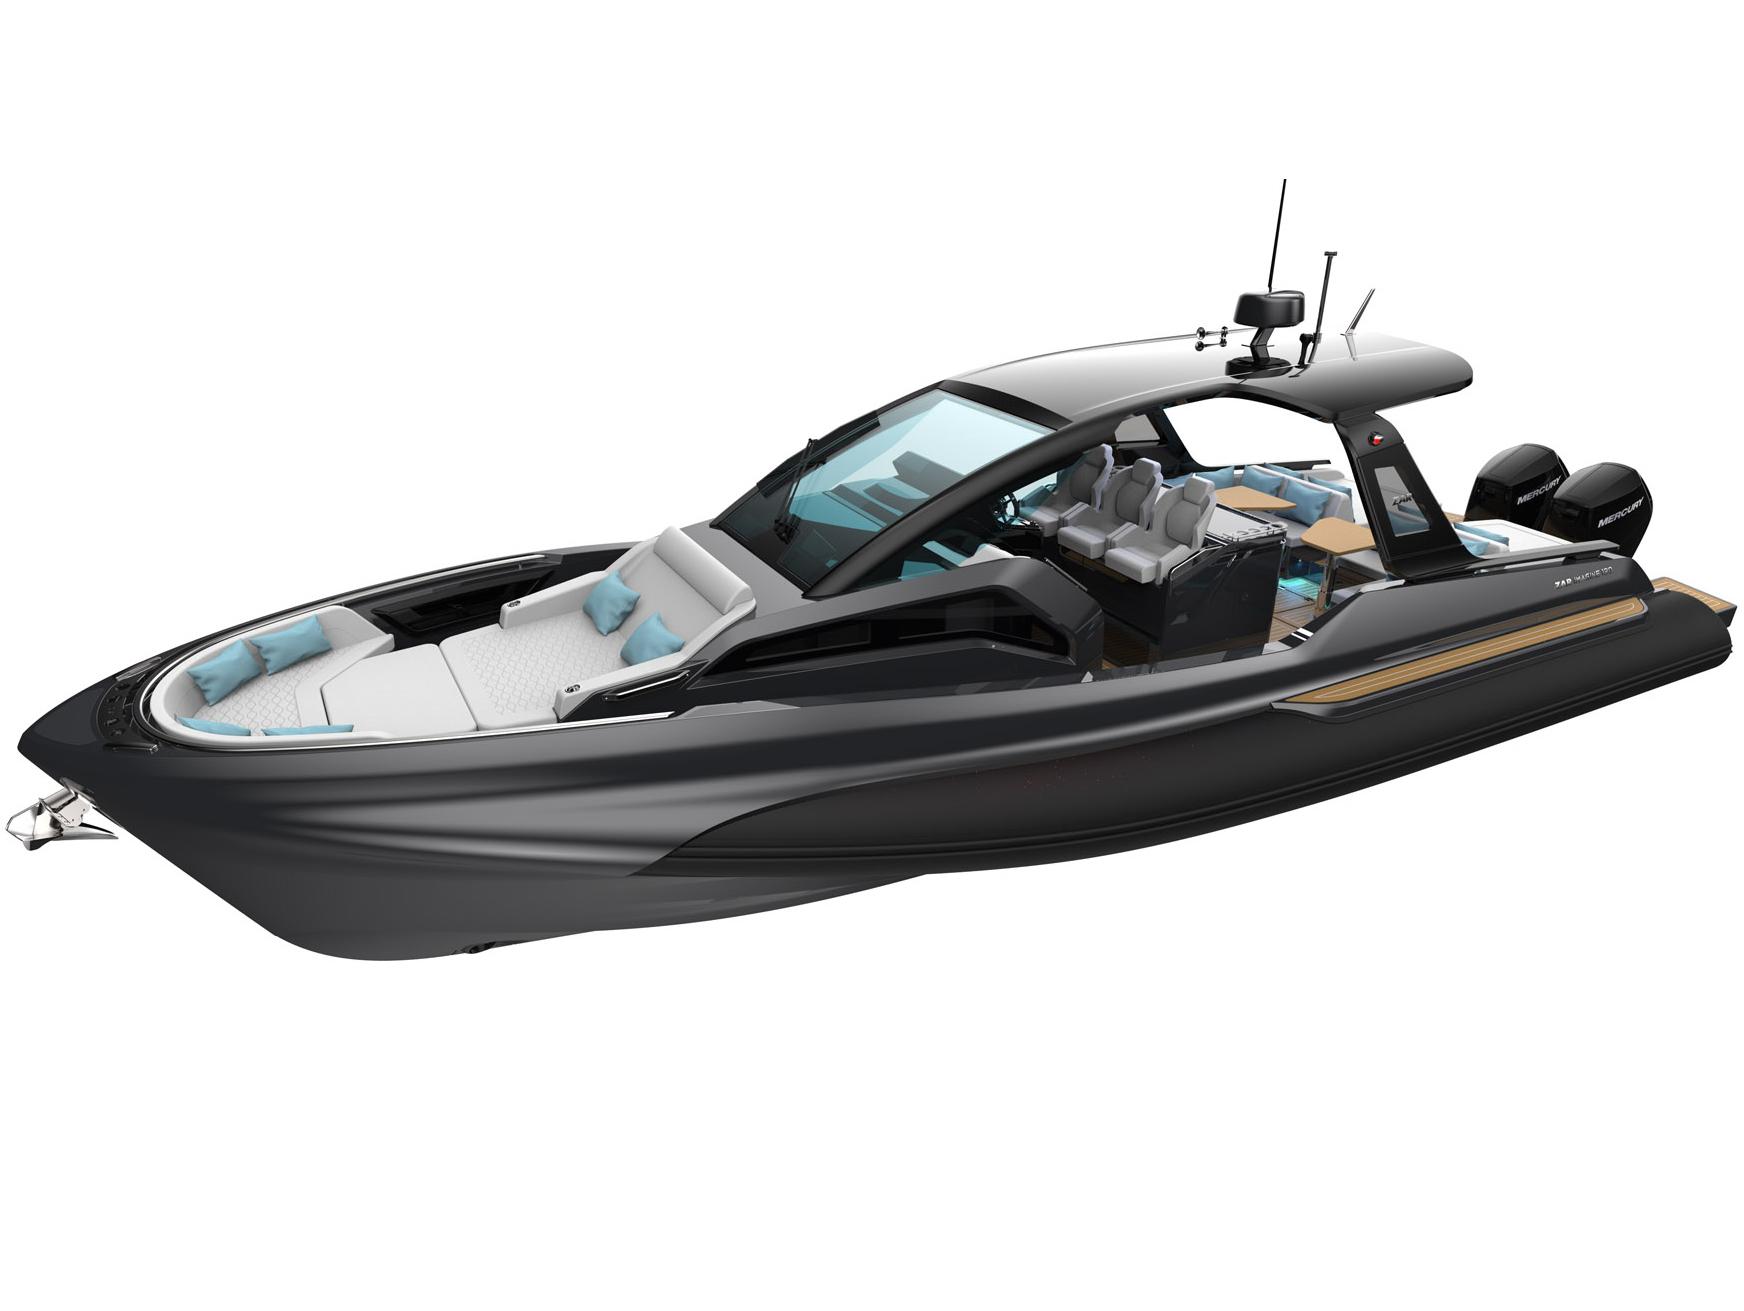 ZAR Imagine 130 Neuboot 2022